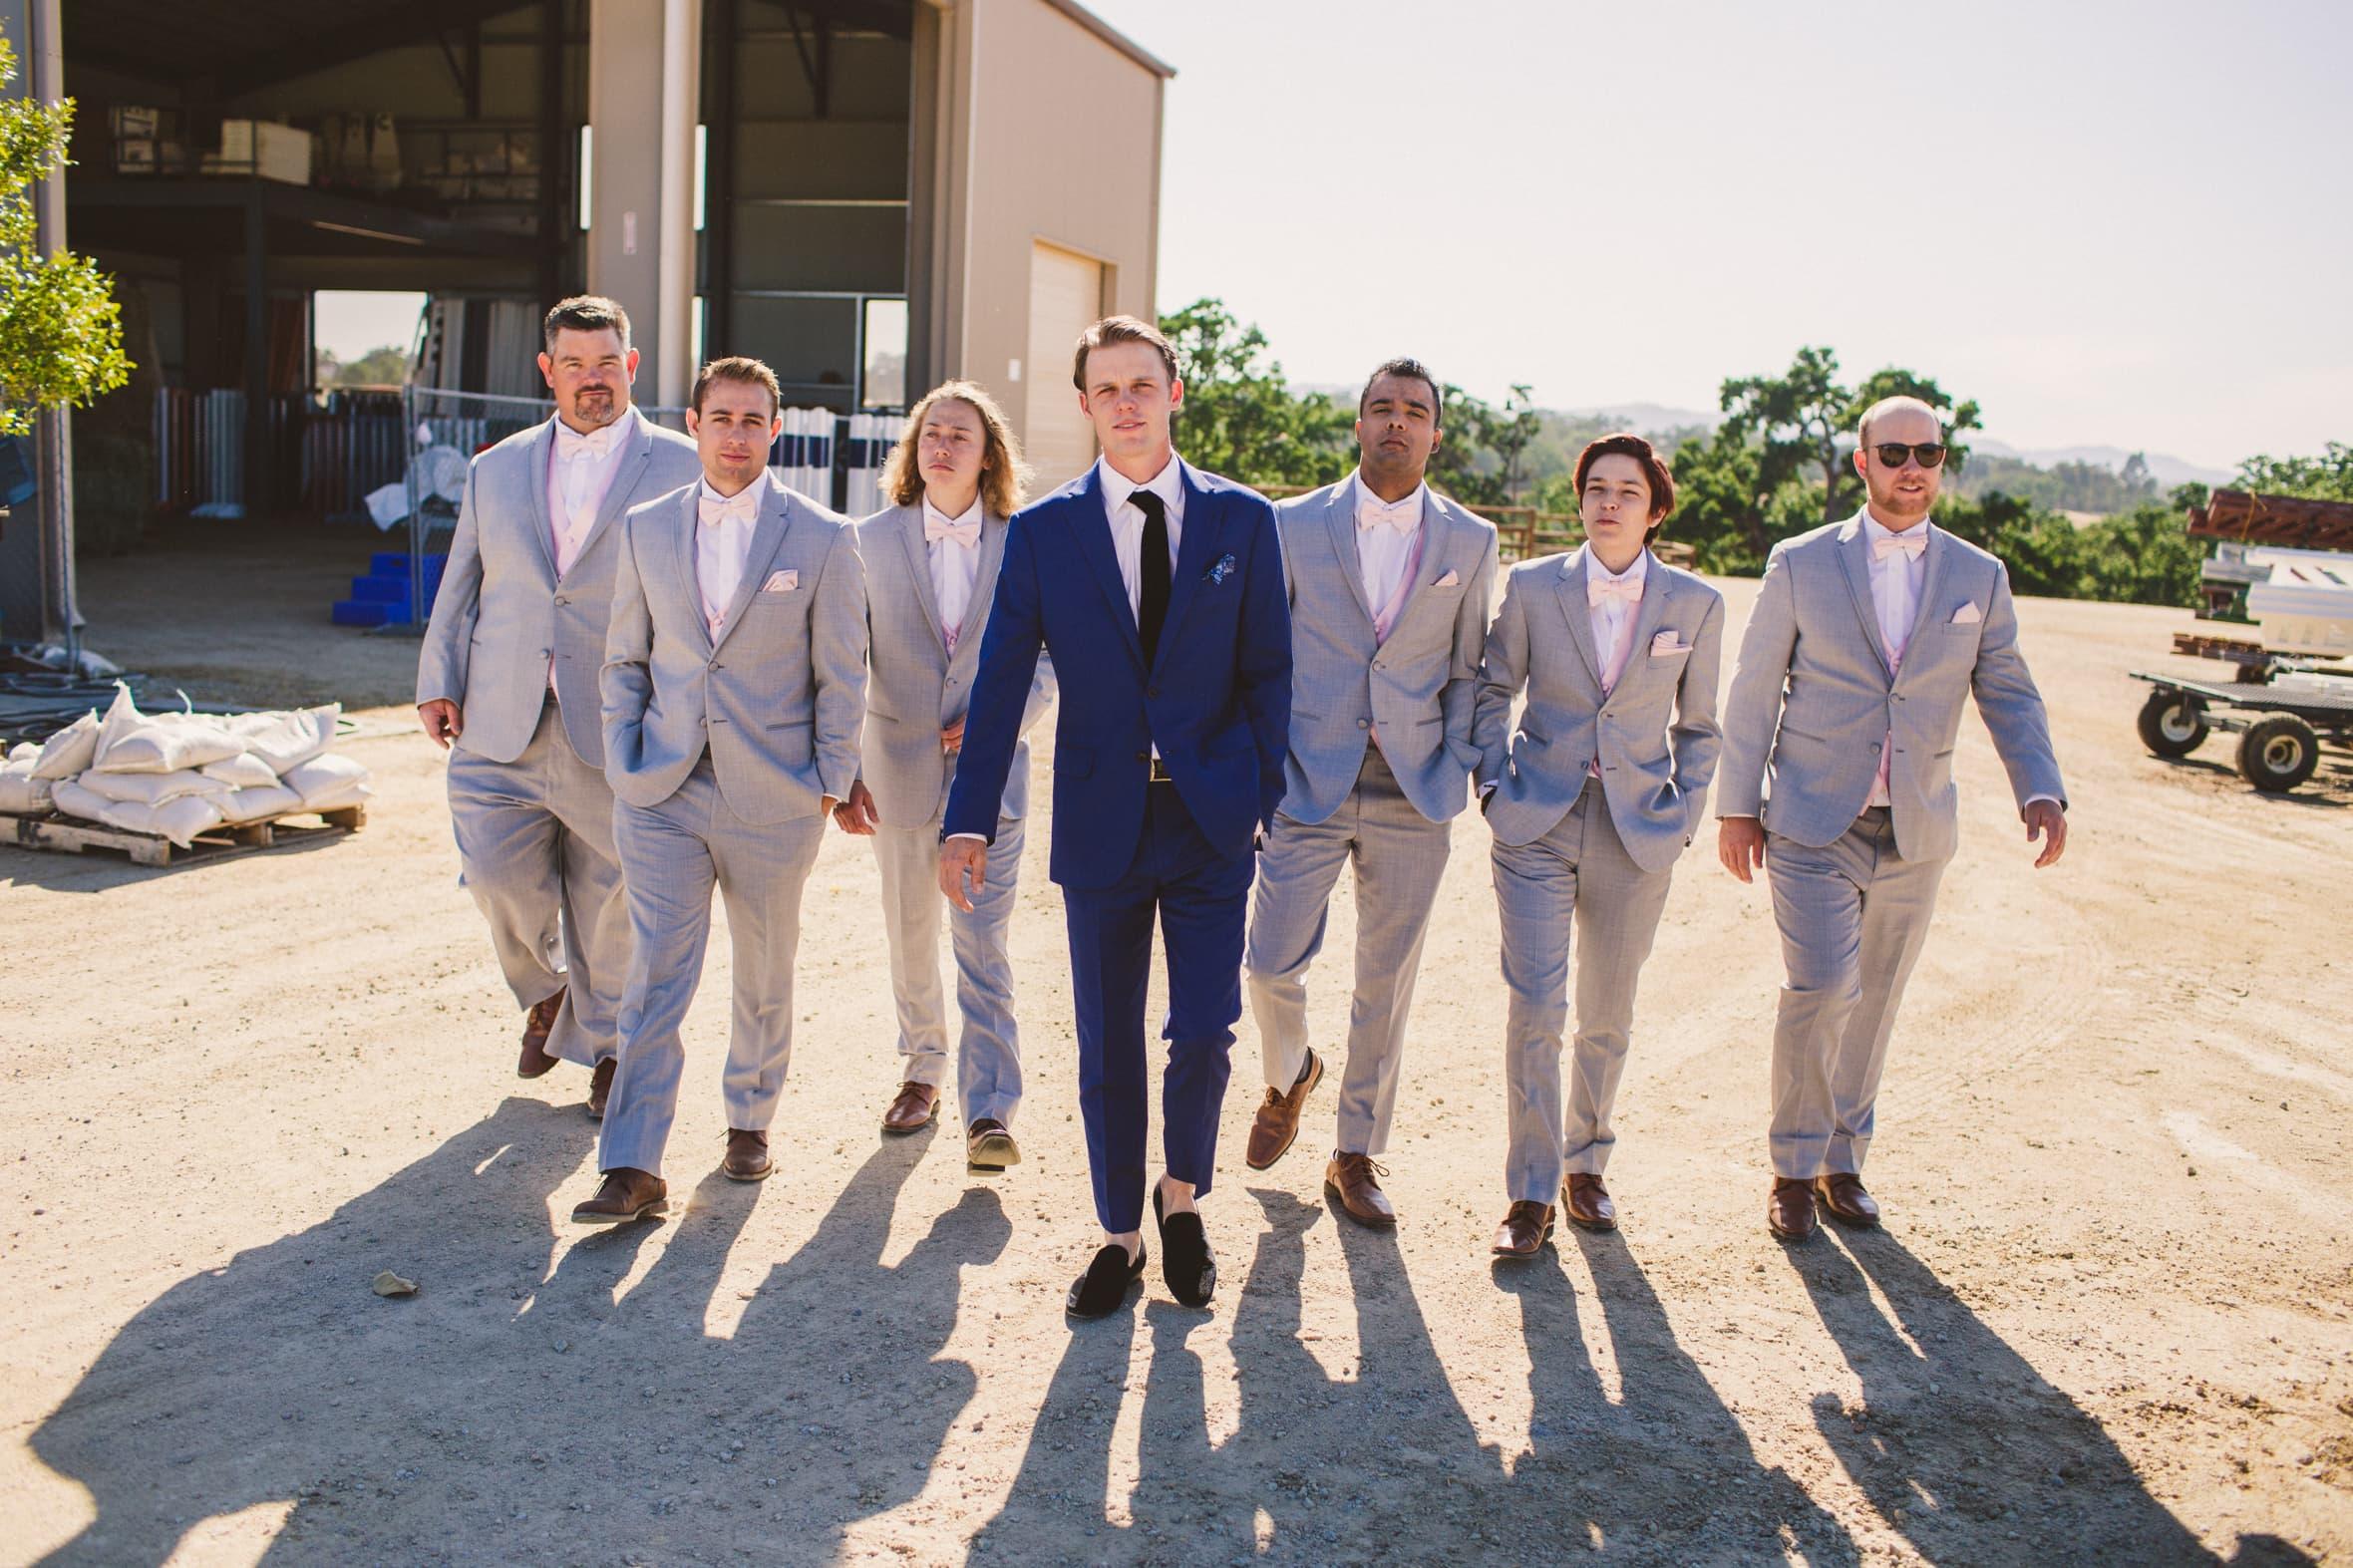 Paso Robles wedding photographer